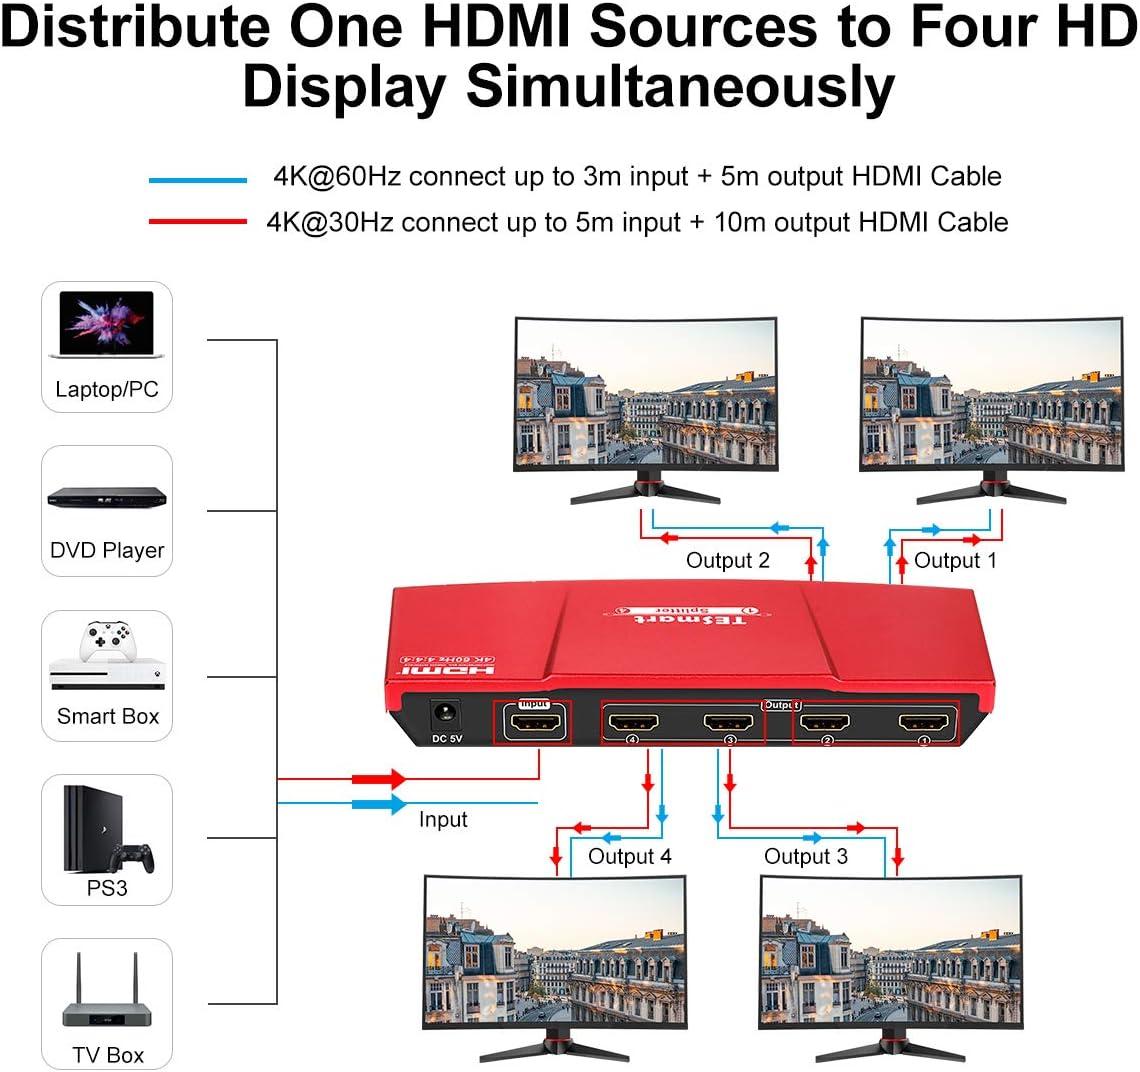 TESmart 1x2 HDMI Splitter 4K HDMI Powered 1 Entradas 2 Salidas HDMI Splitter Monitor Duplicaci/ón de Audio y Video Dual para Ultra HD 4K x 2K @60Hz //HDCP 2.2 //3D y HDR//HD STB